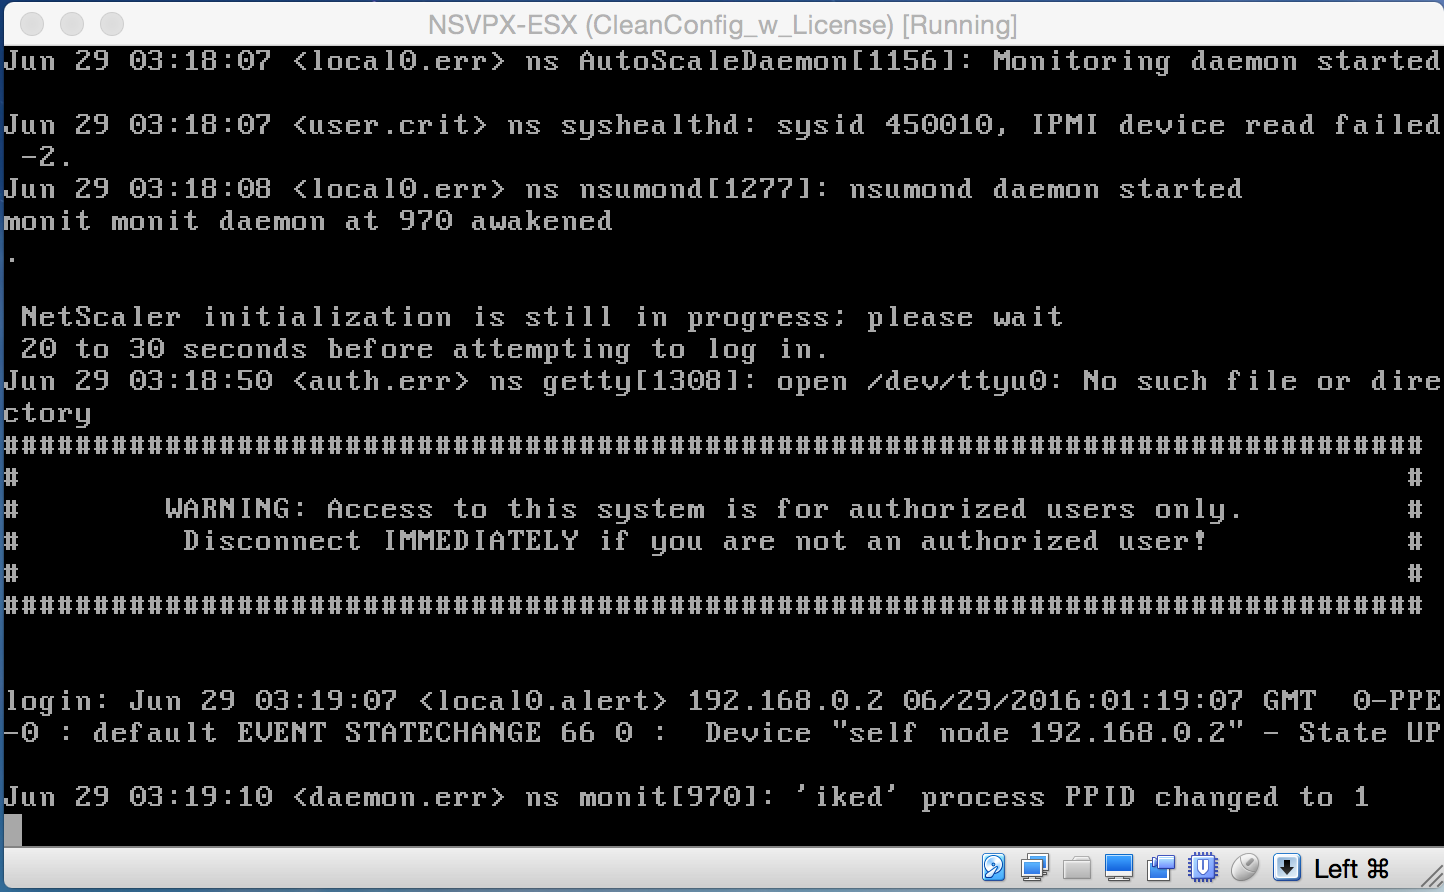 HowTo: Run a Citrix NetScaler VPX on Oracle VirtualBox